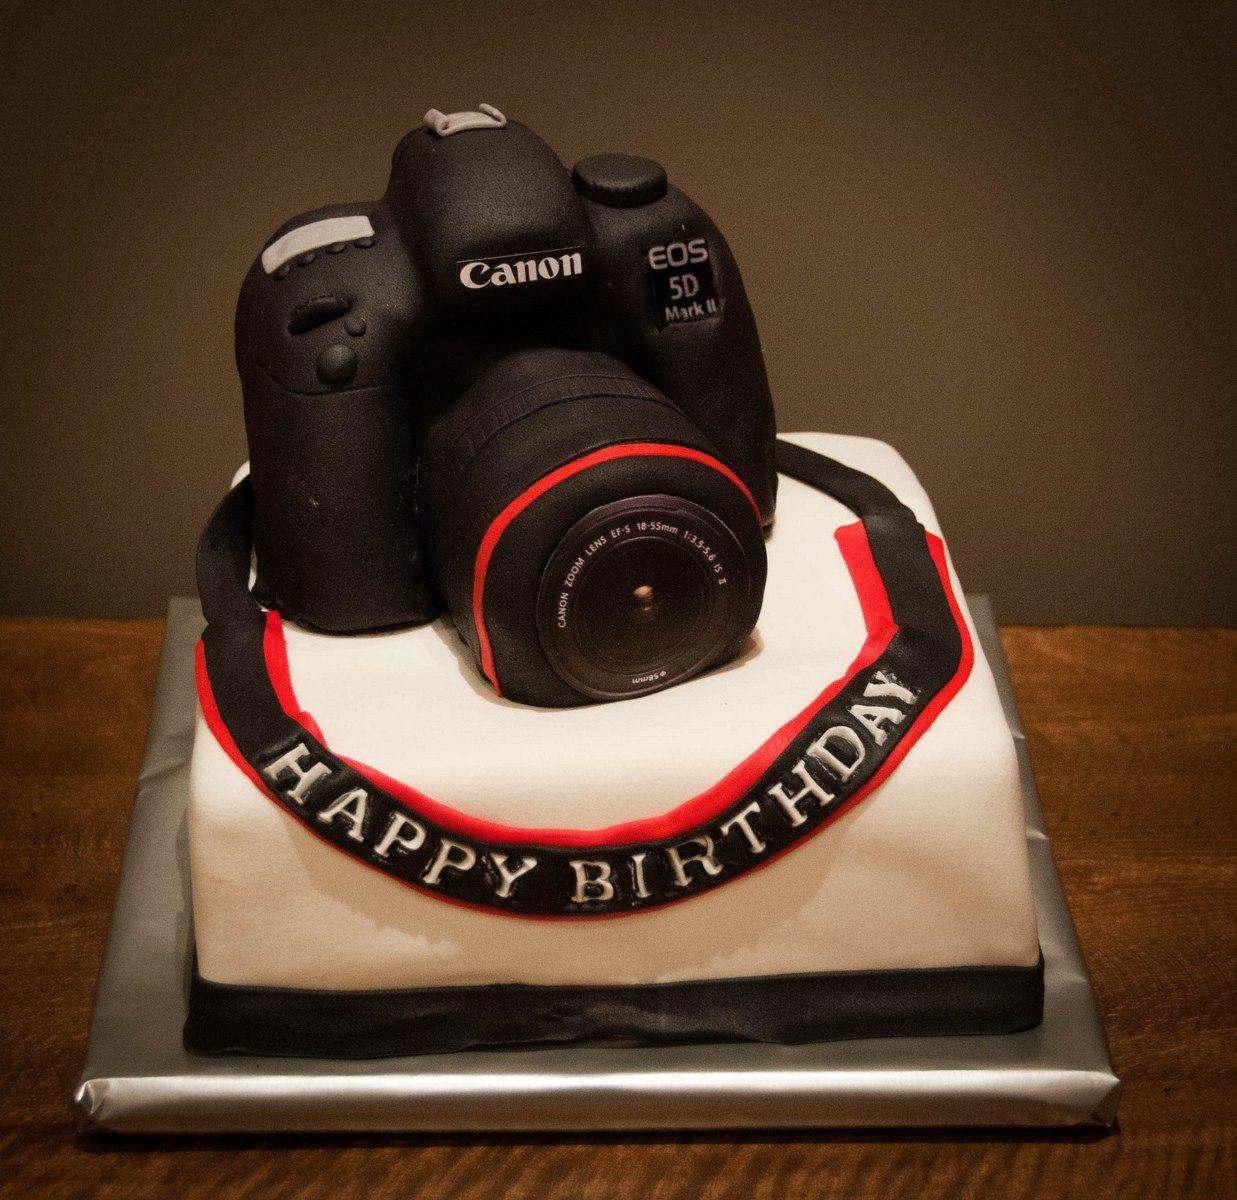 Fantastic Canon Cakes Burcinin Lezzet Butigi Canon Cake Pasta Fotograf Personalised Birthday Cards Veneteletsinfo